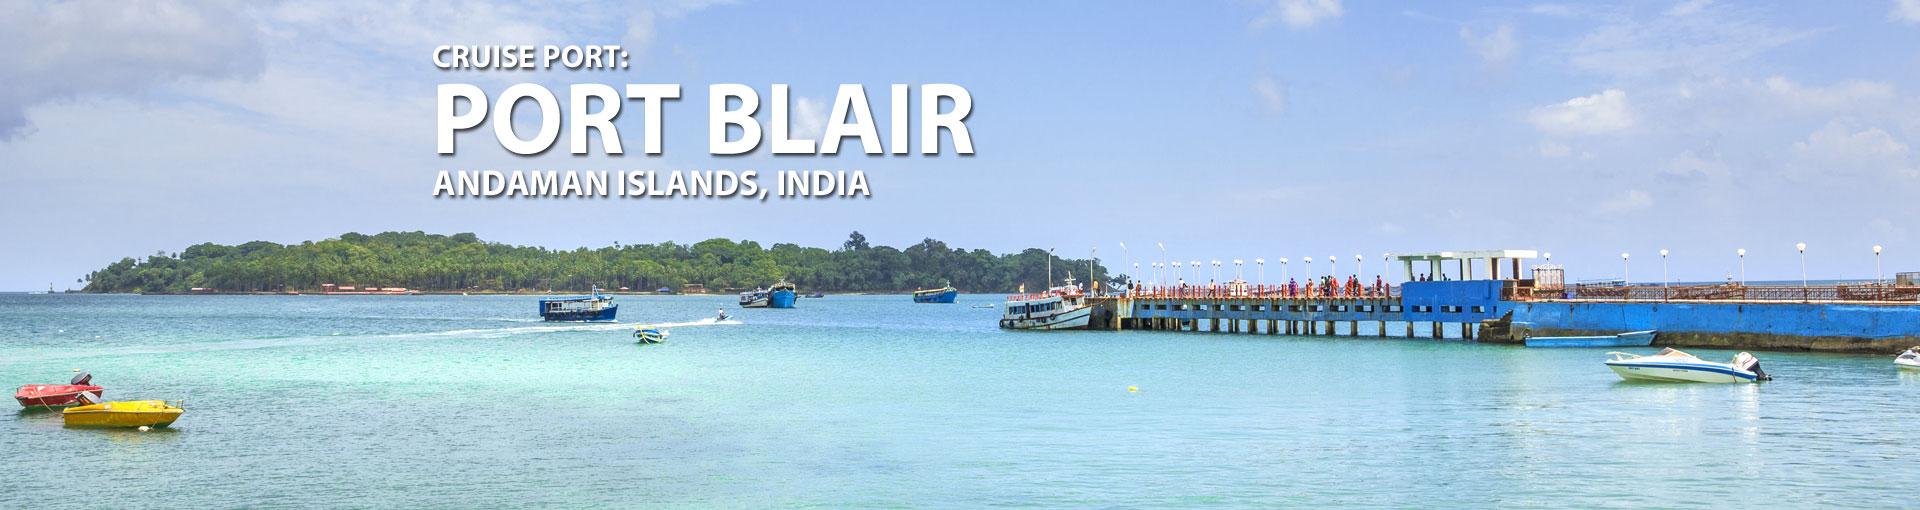 Cruises to Port Blair, Andaman Islands, India